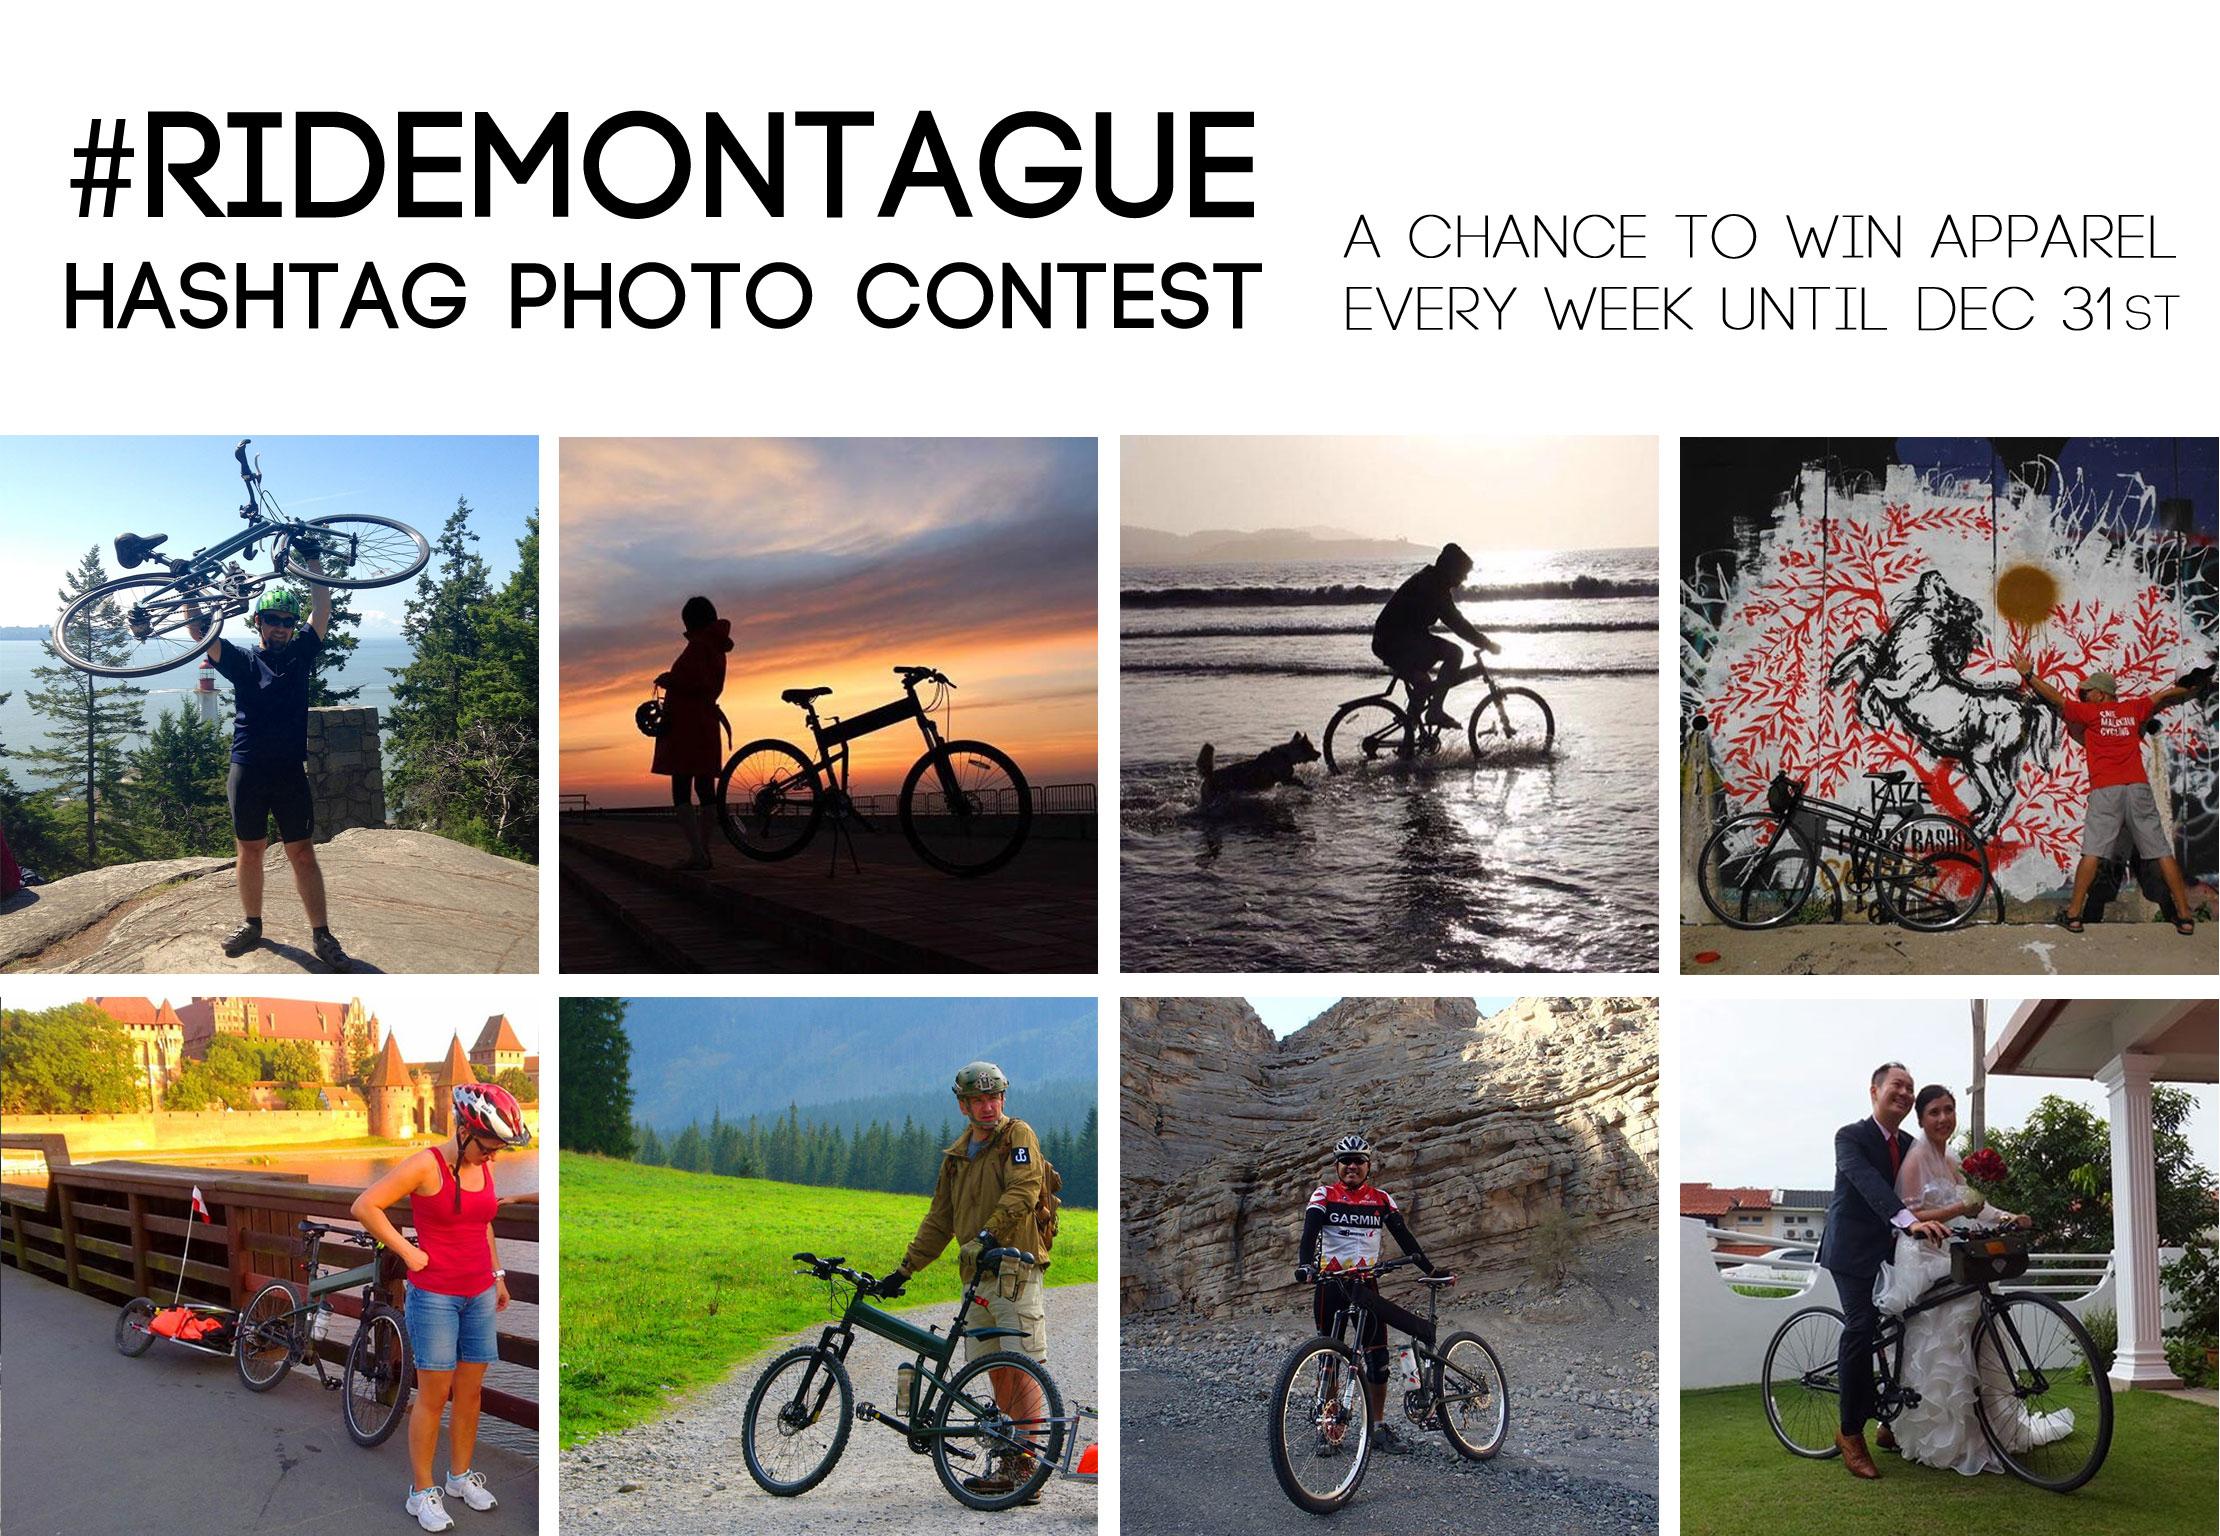 Hashtag-Photo-Contest-Image-1